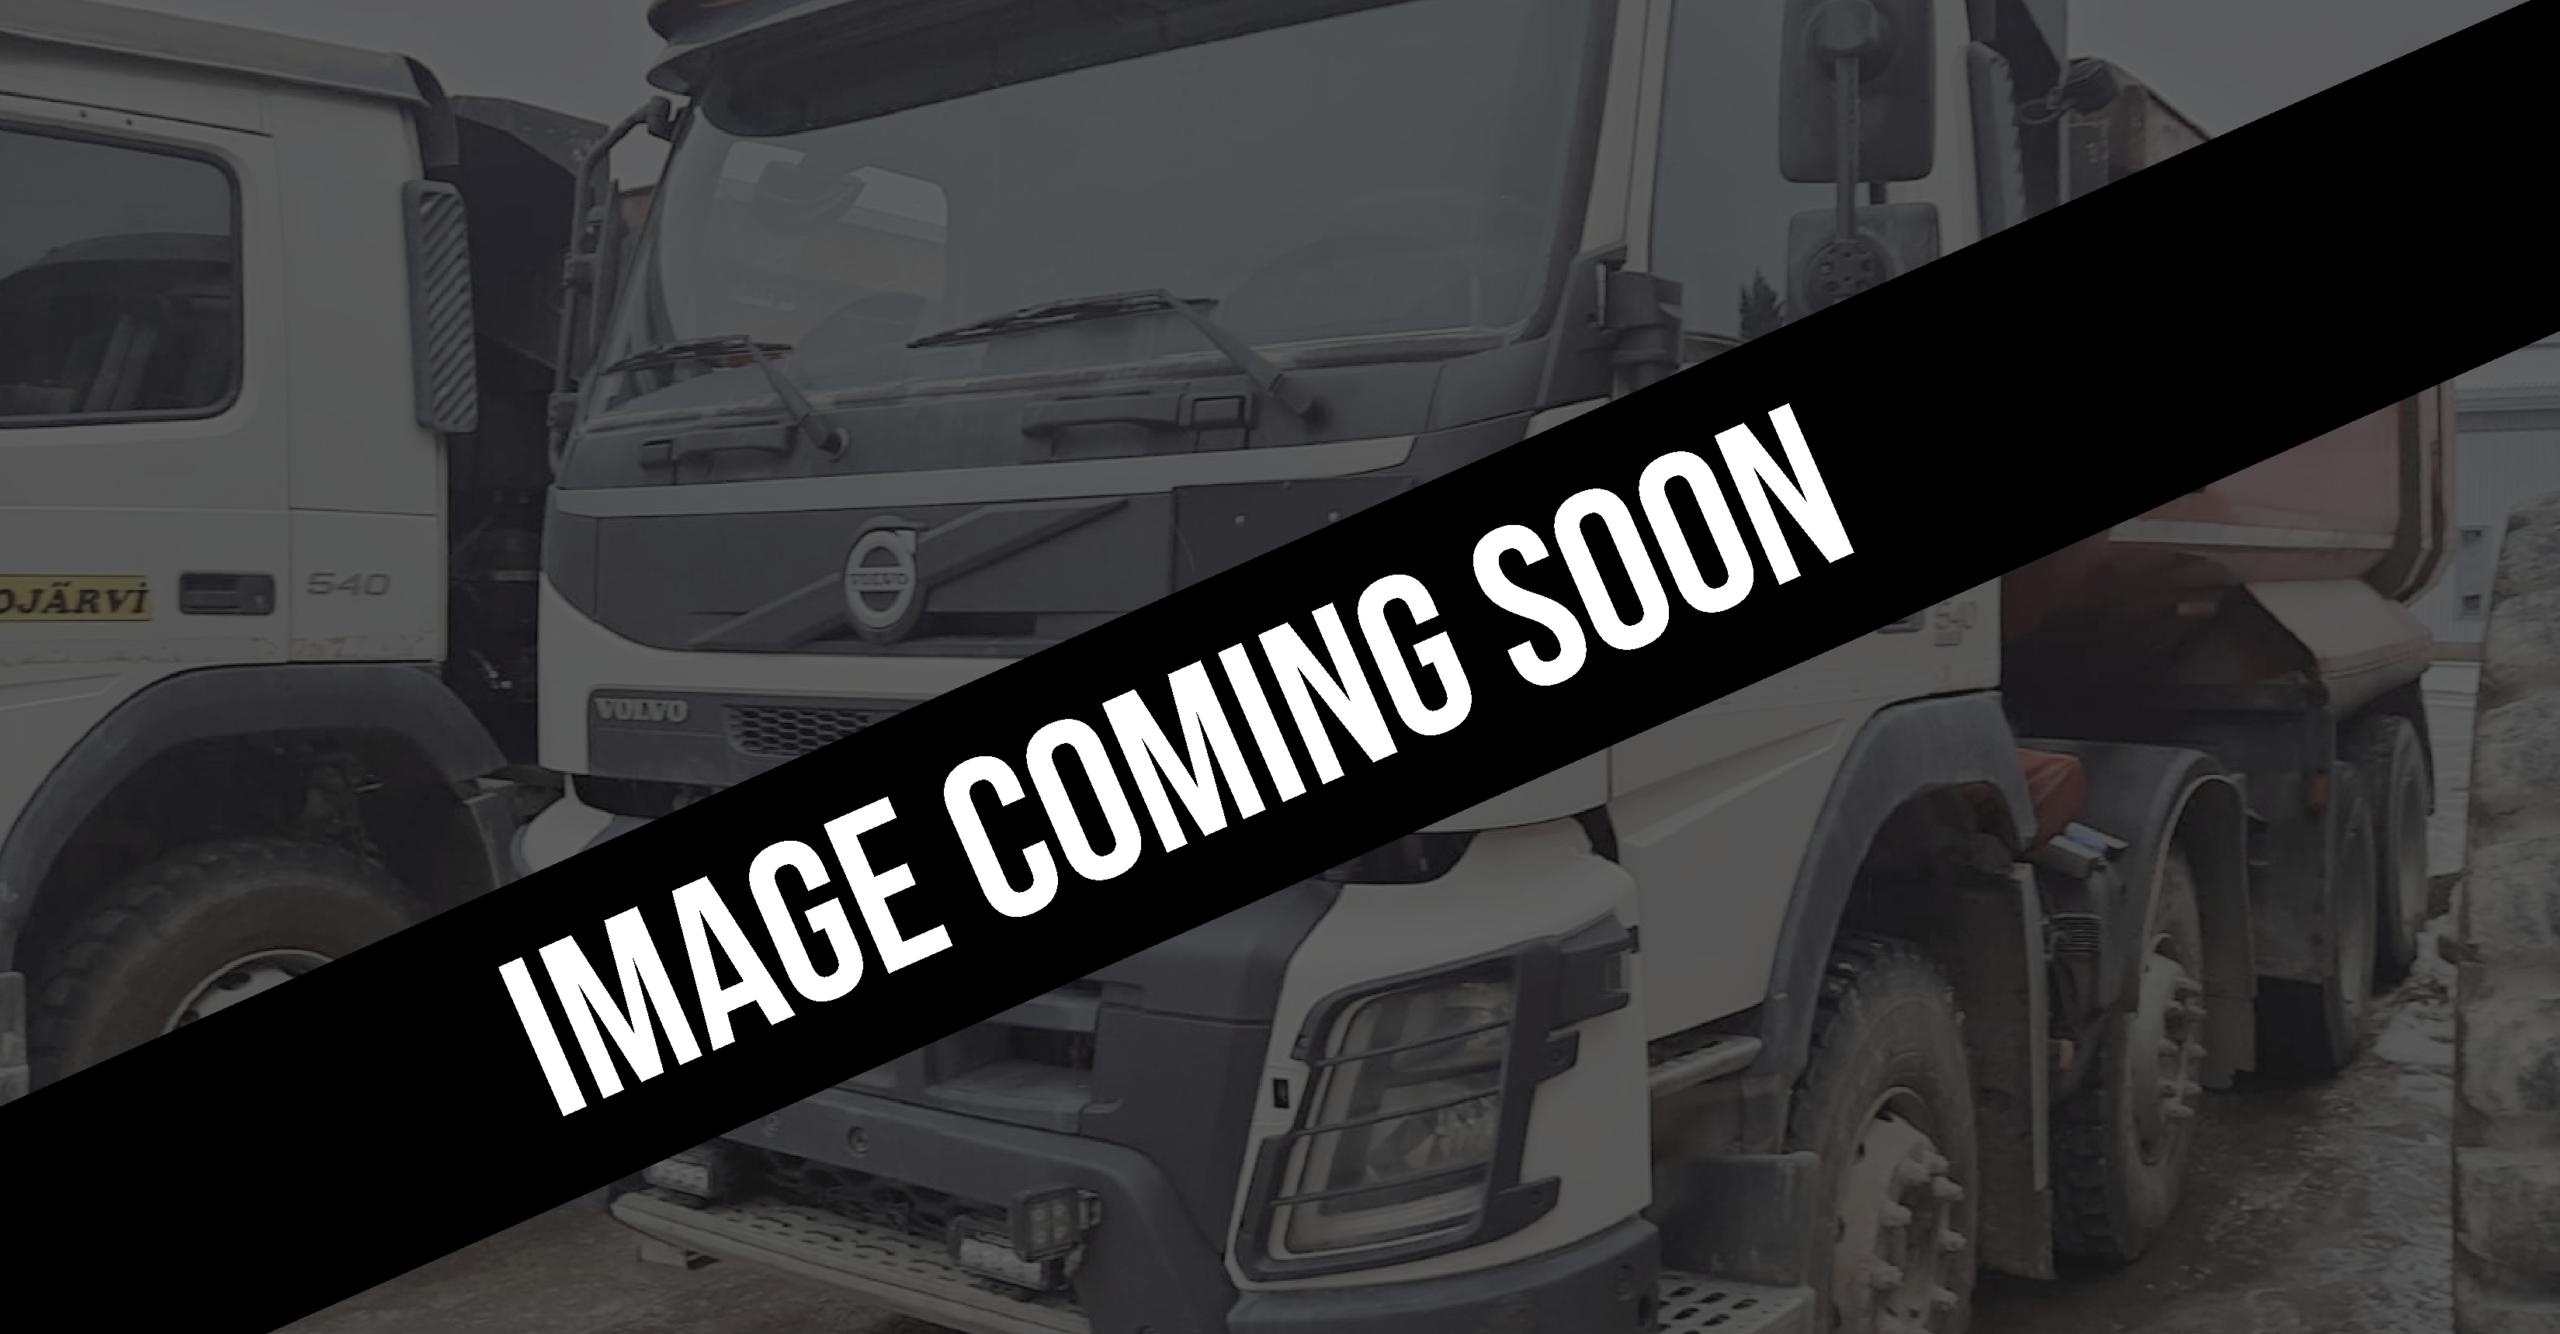 Image-coming-soon-1-aspect-ratio-1440-750